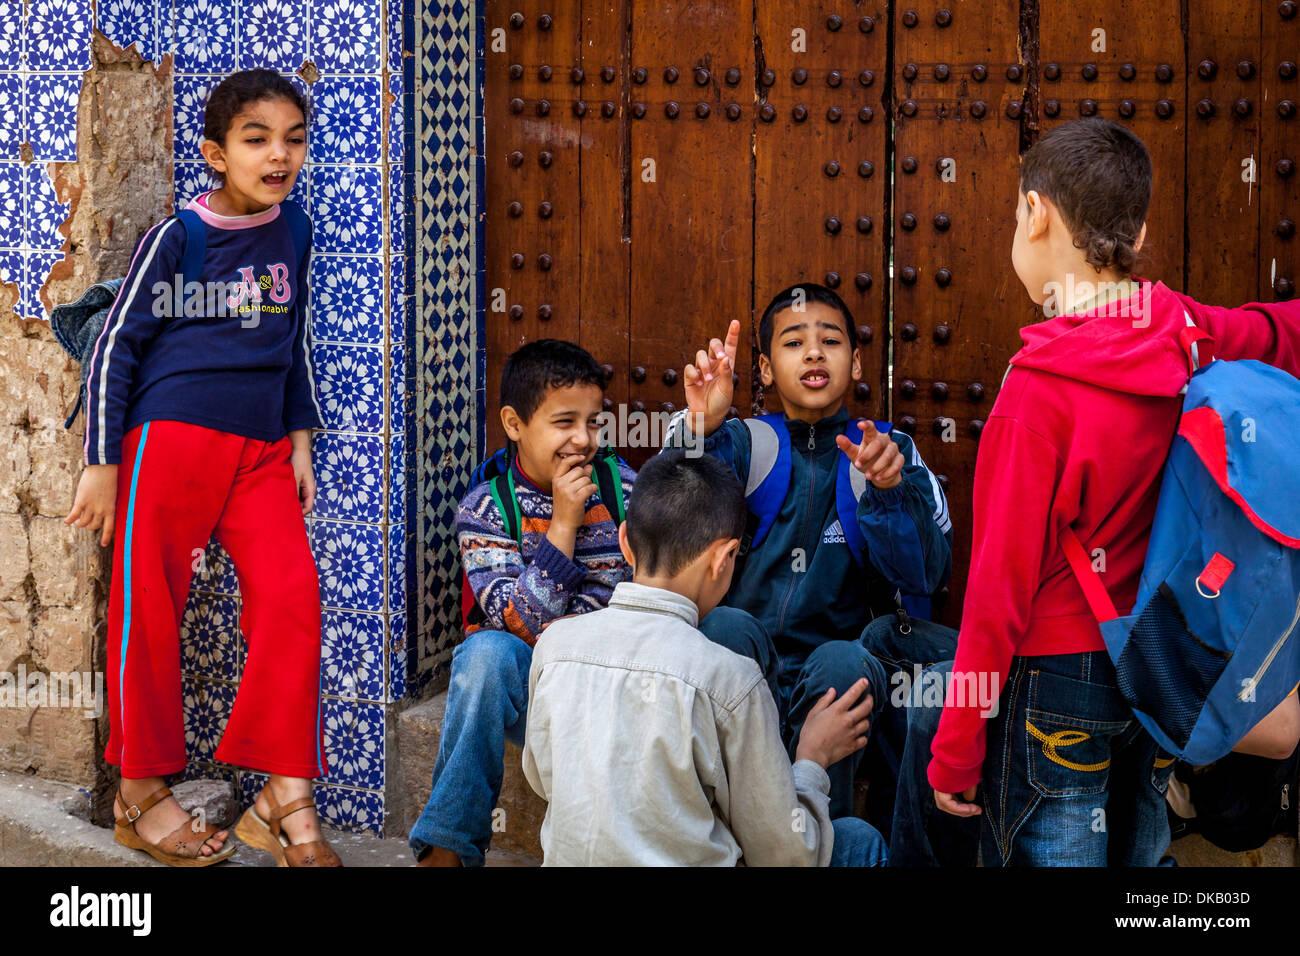 Local Schoolchildren, Fez, Morocco - Stock Image